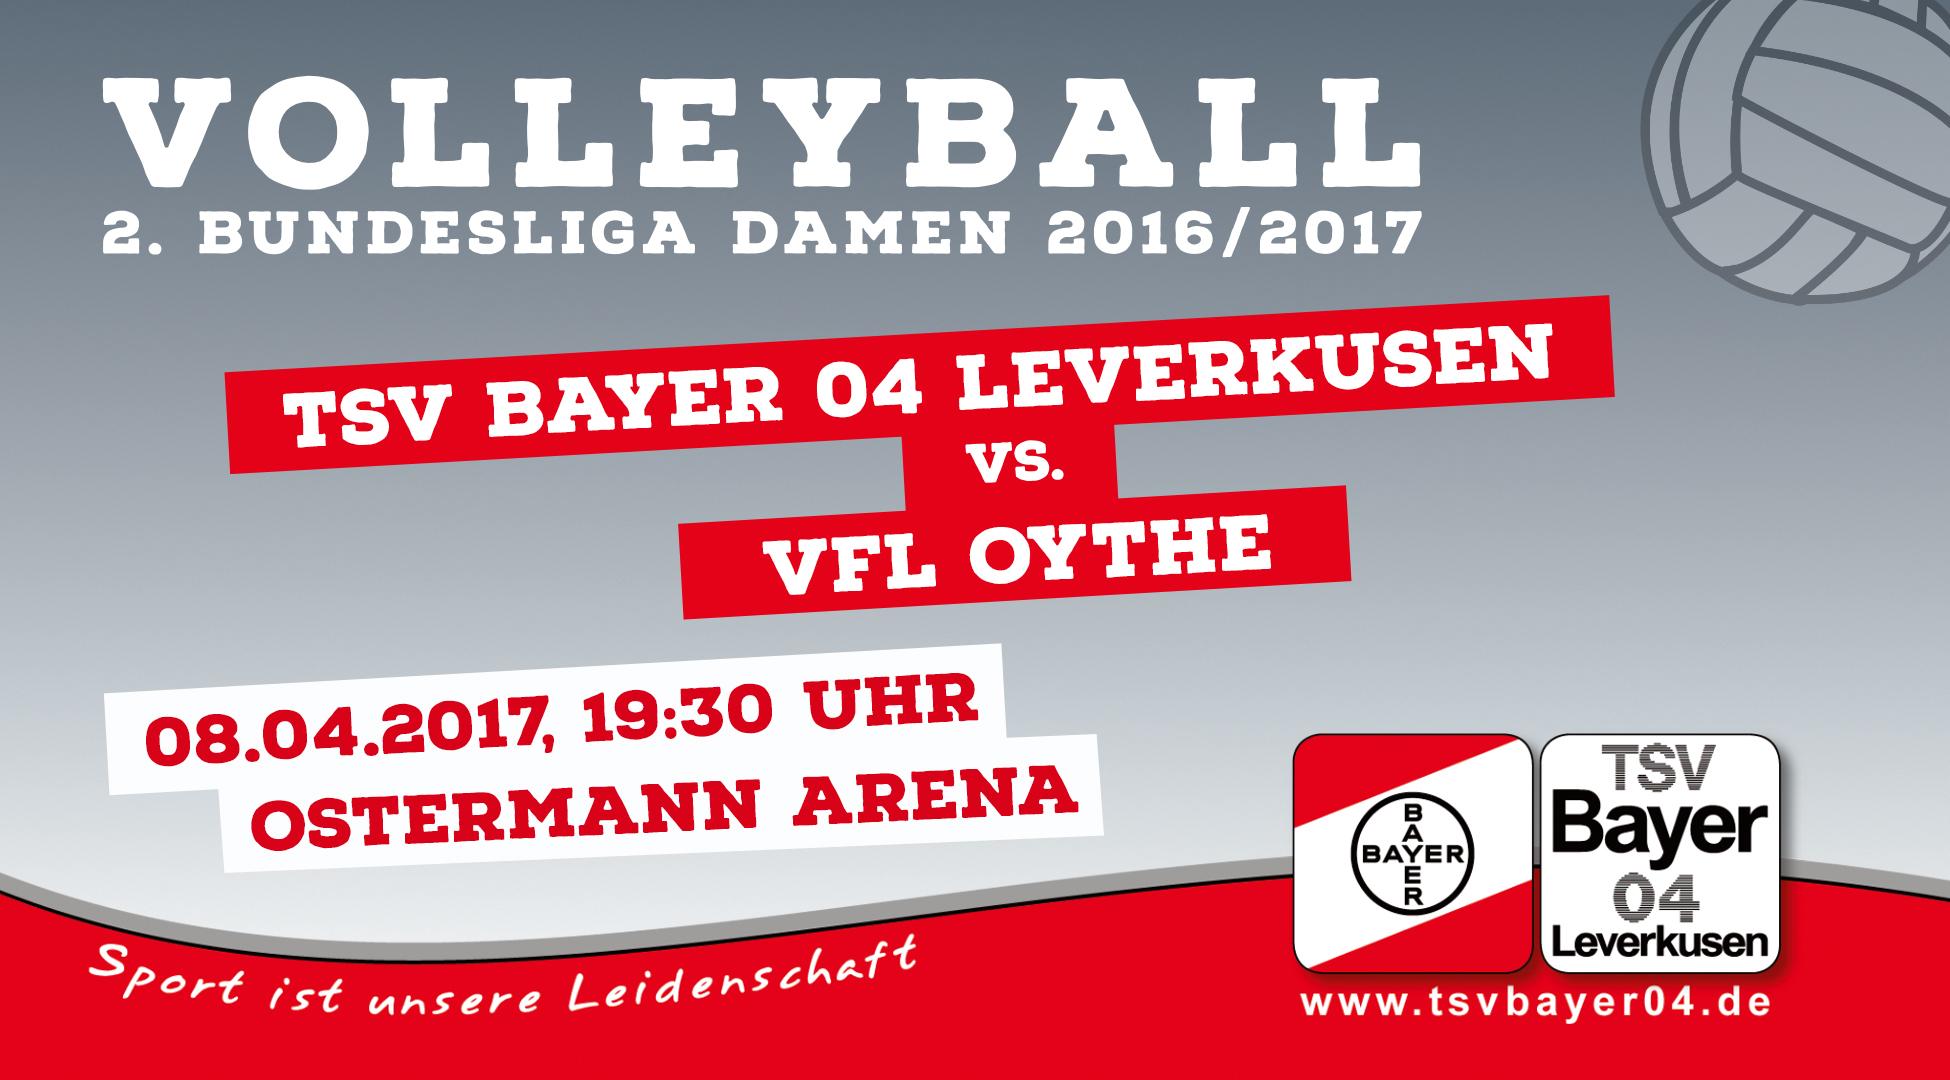 tsv bayer leverkusen volleyball